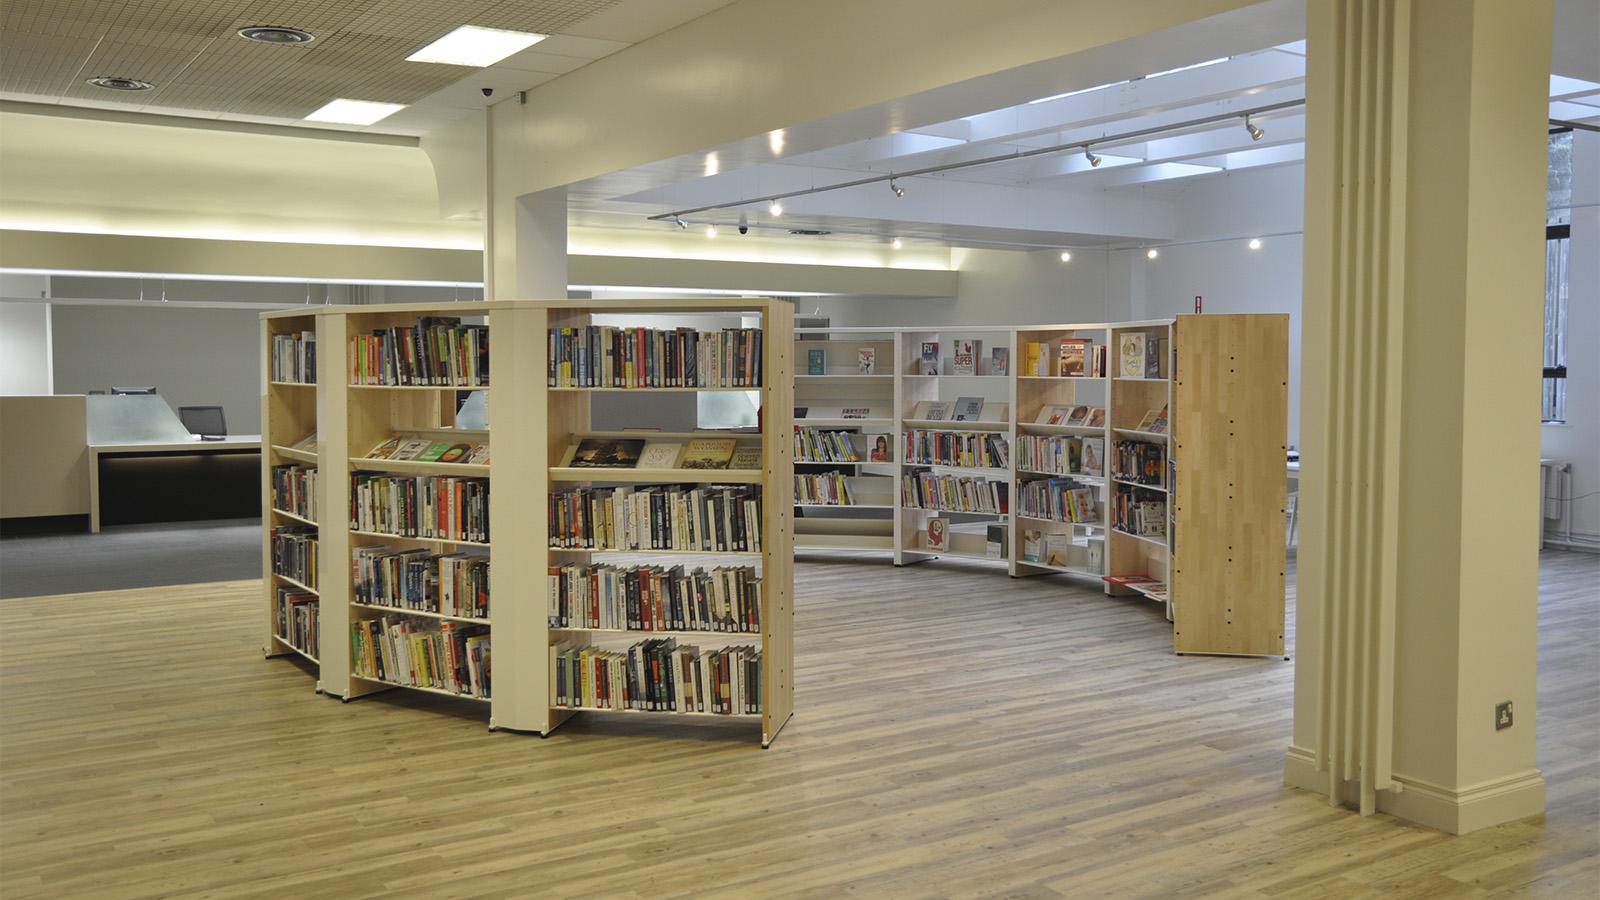 Newry bibliotek, Irland